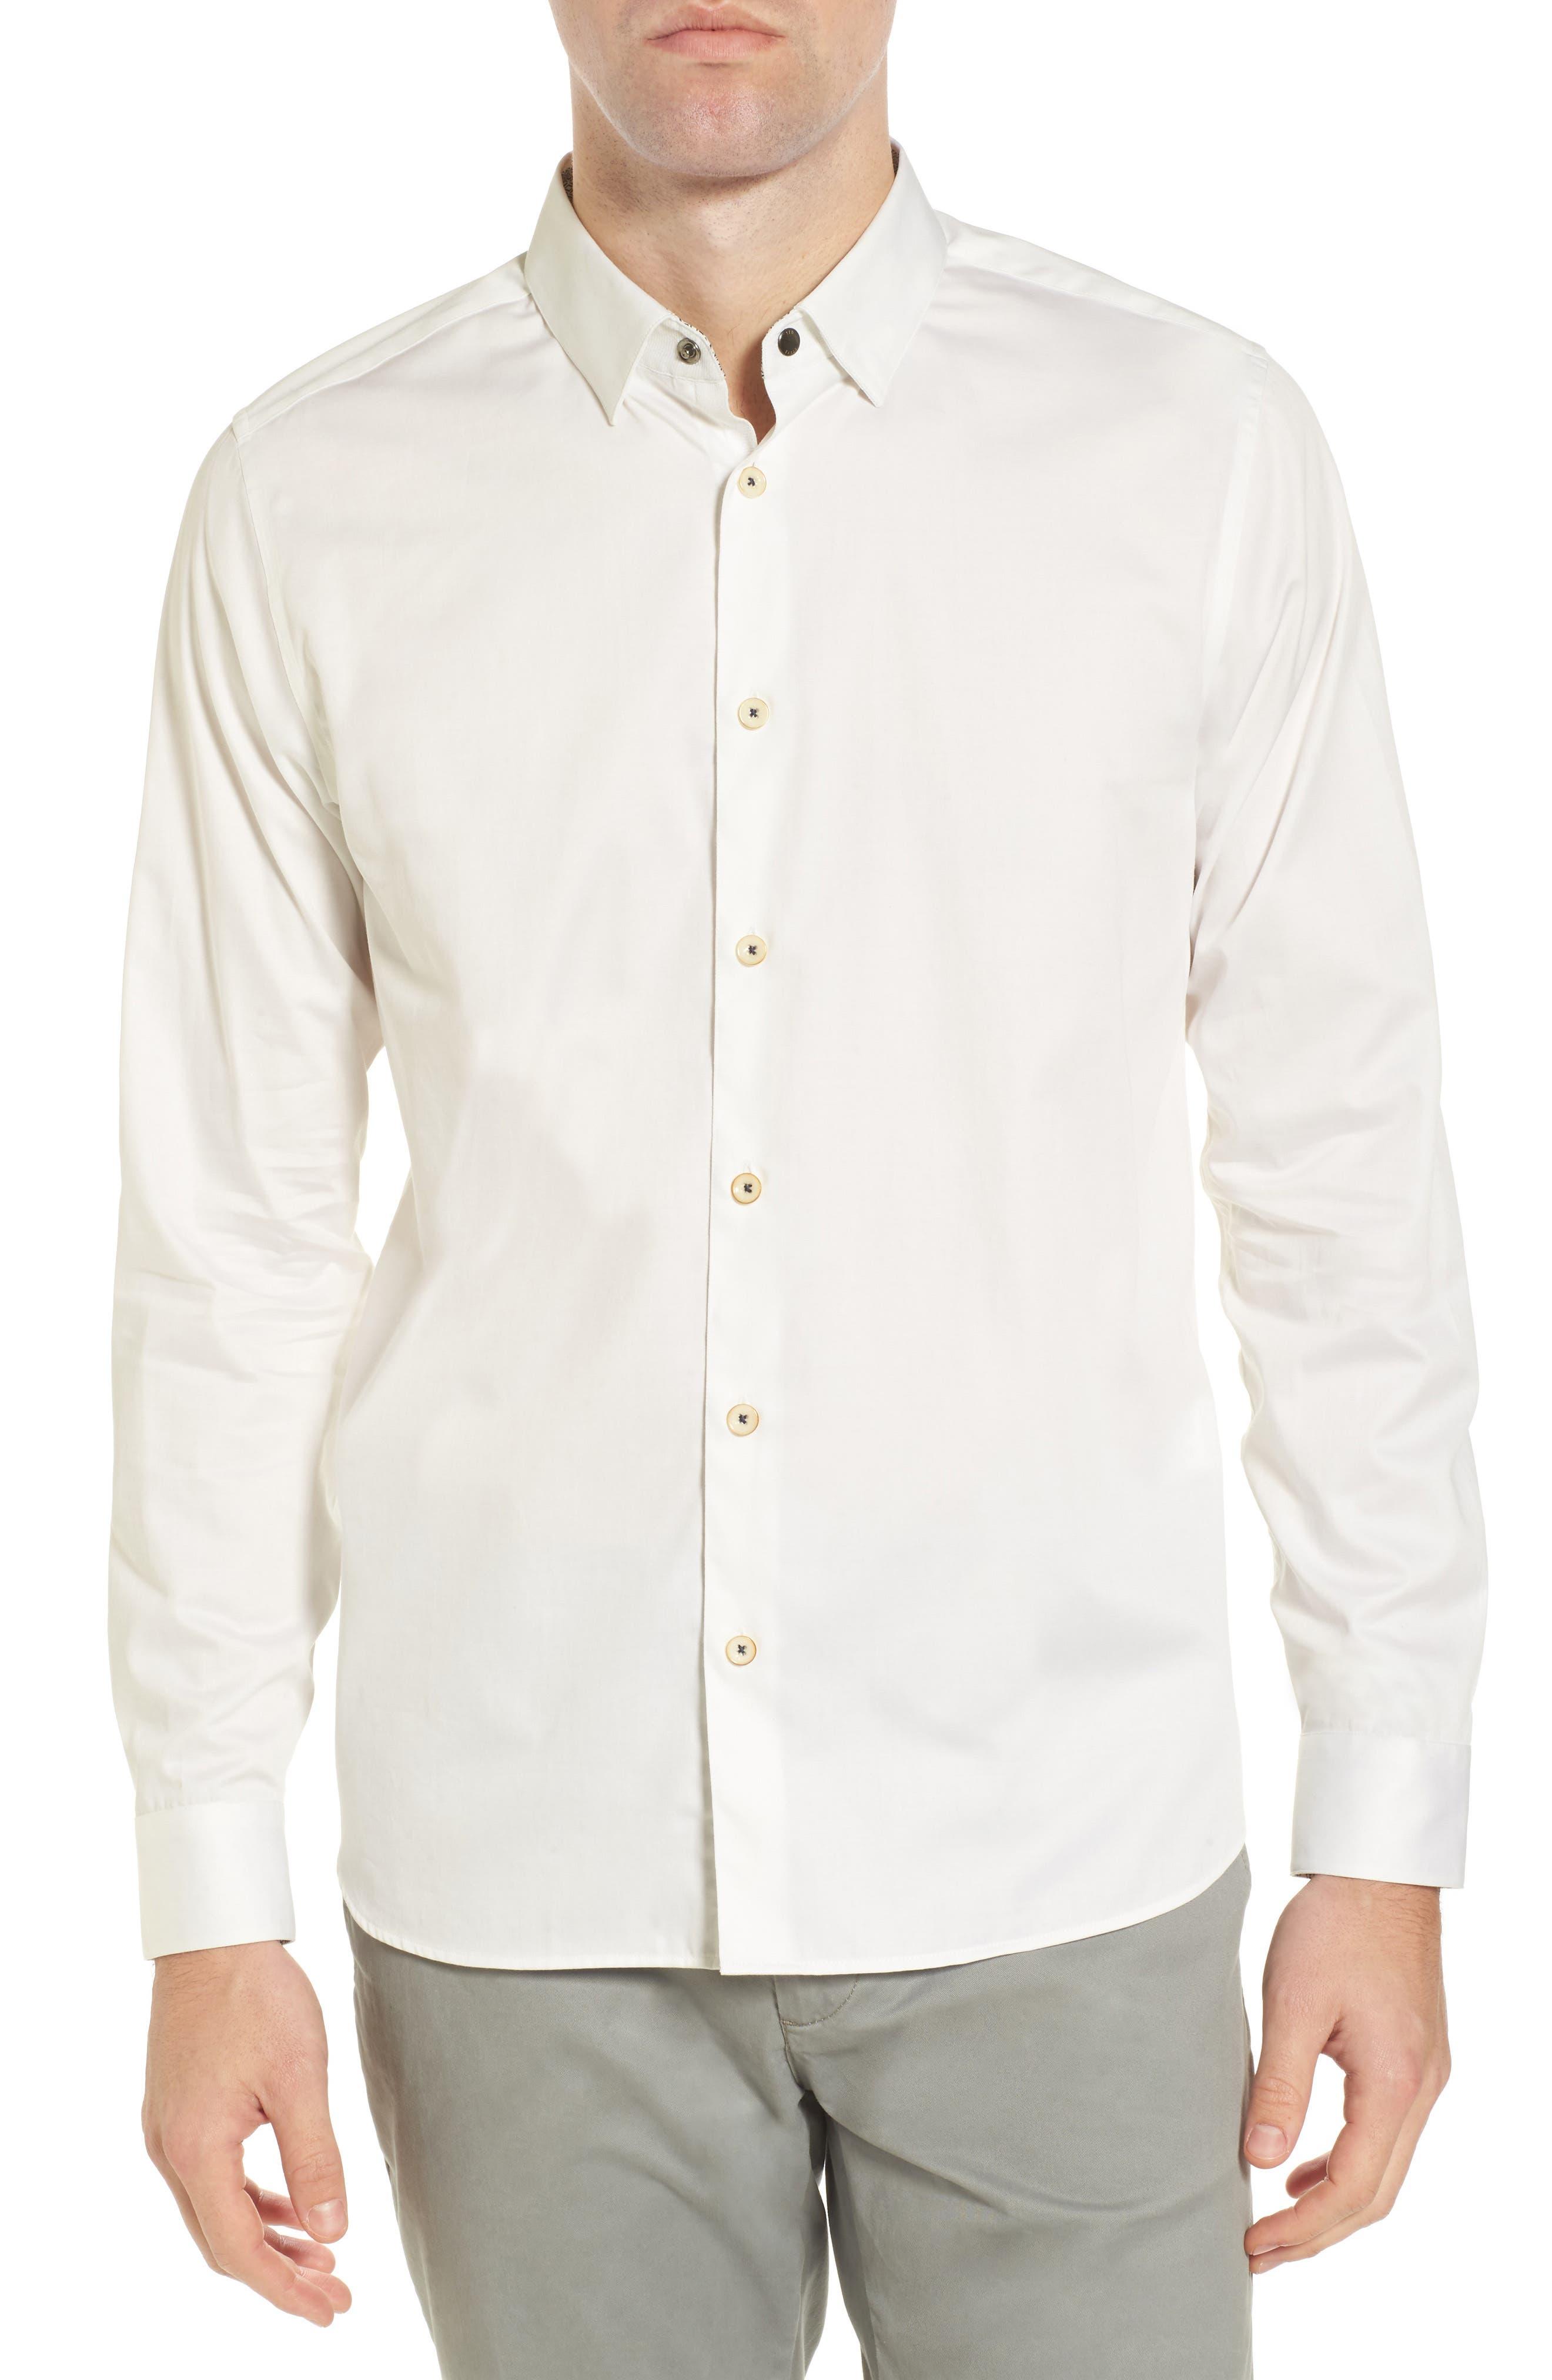 Byllytt Extra Slim Fit Stretch Solid Sport Shirt,                             Main thumbnail 1, color,                             100